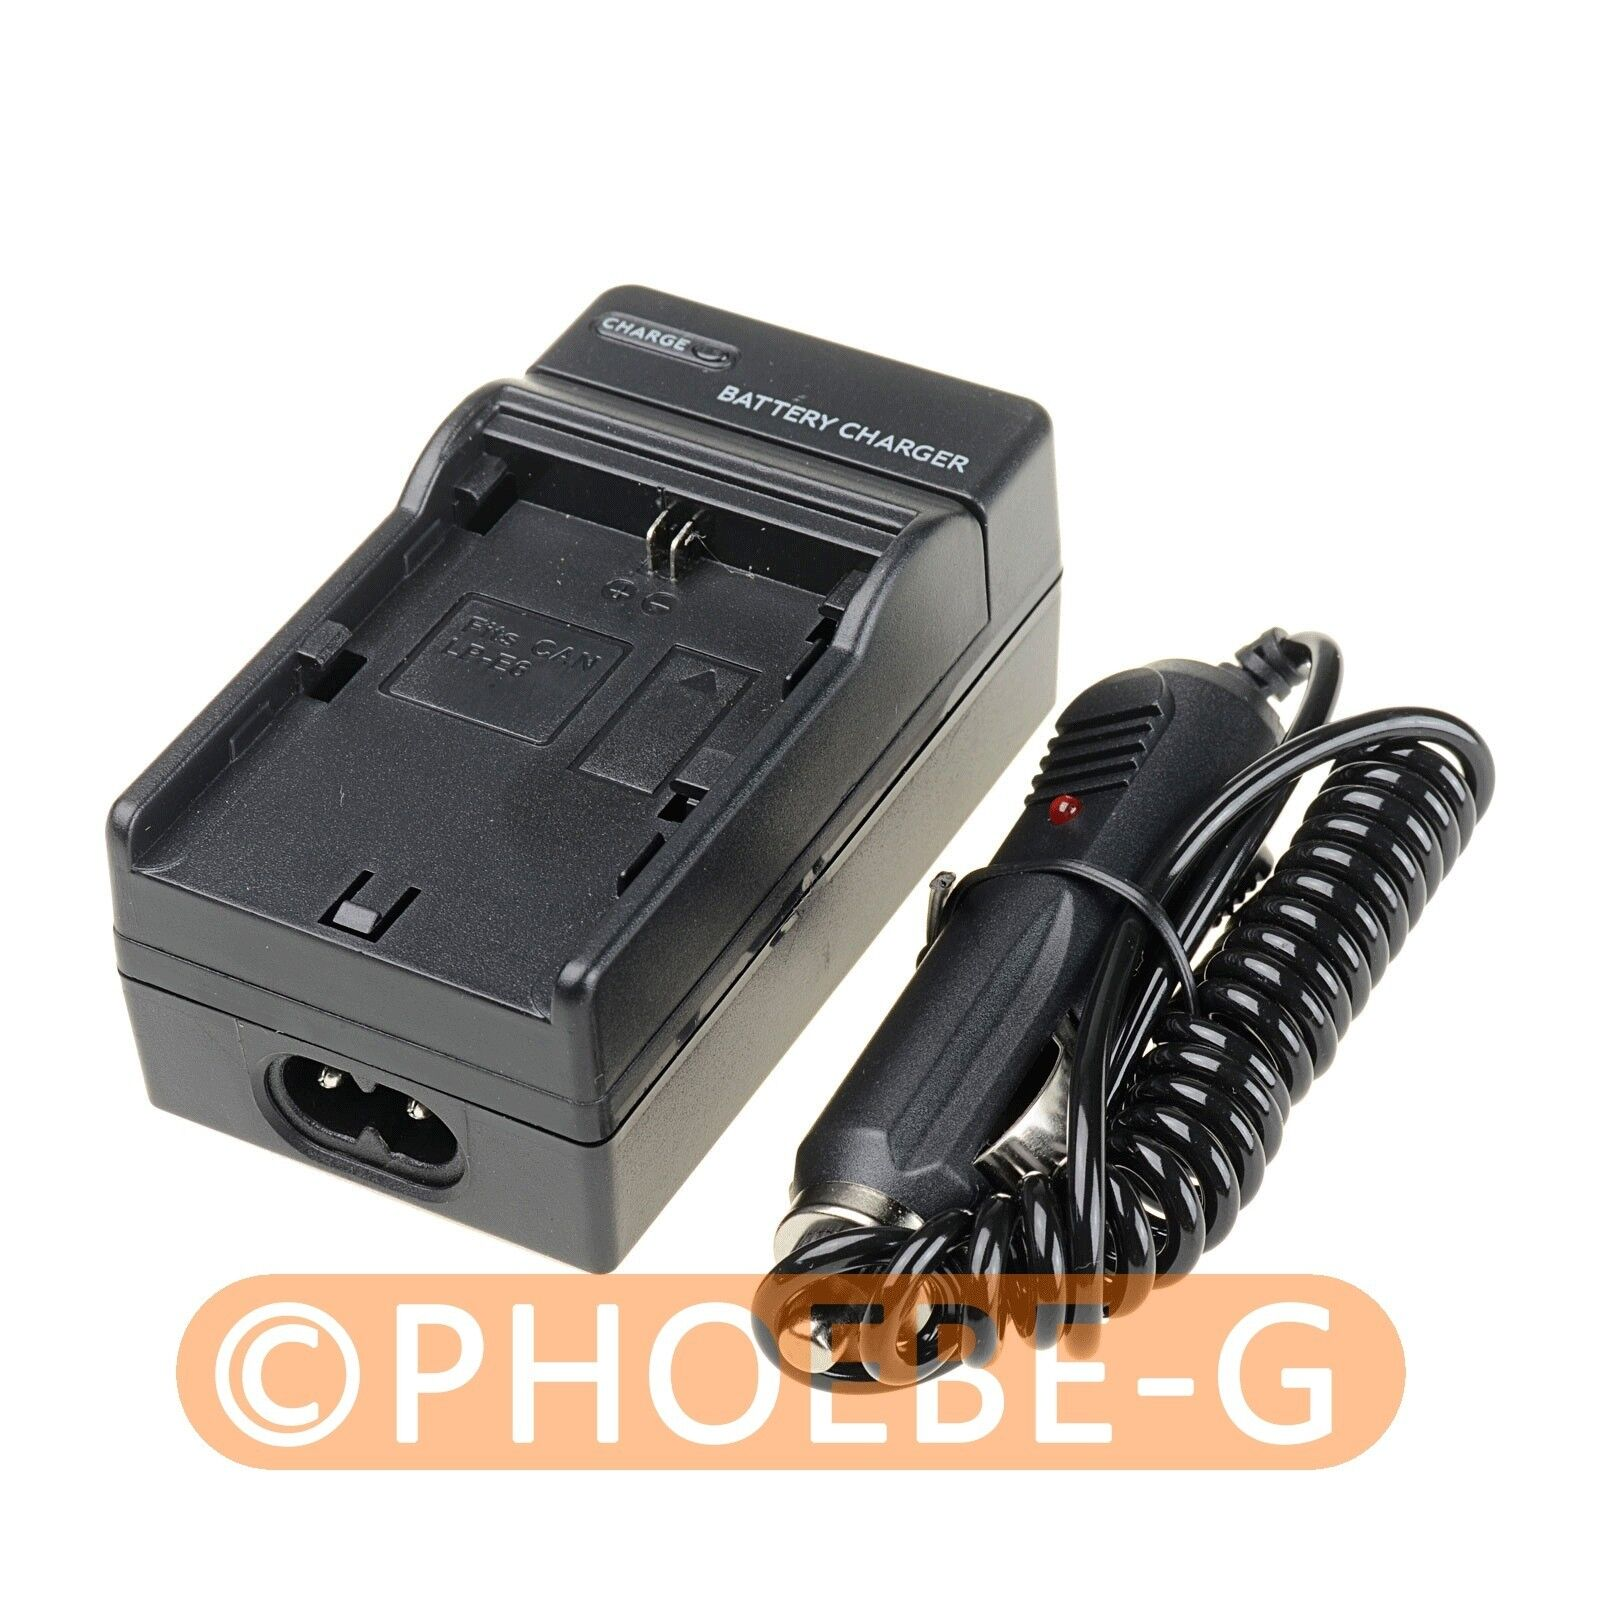 Camera Battery Car Charger LP-E6 for Canon 7D 5D Mark II 6D 60D